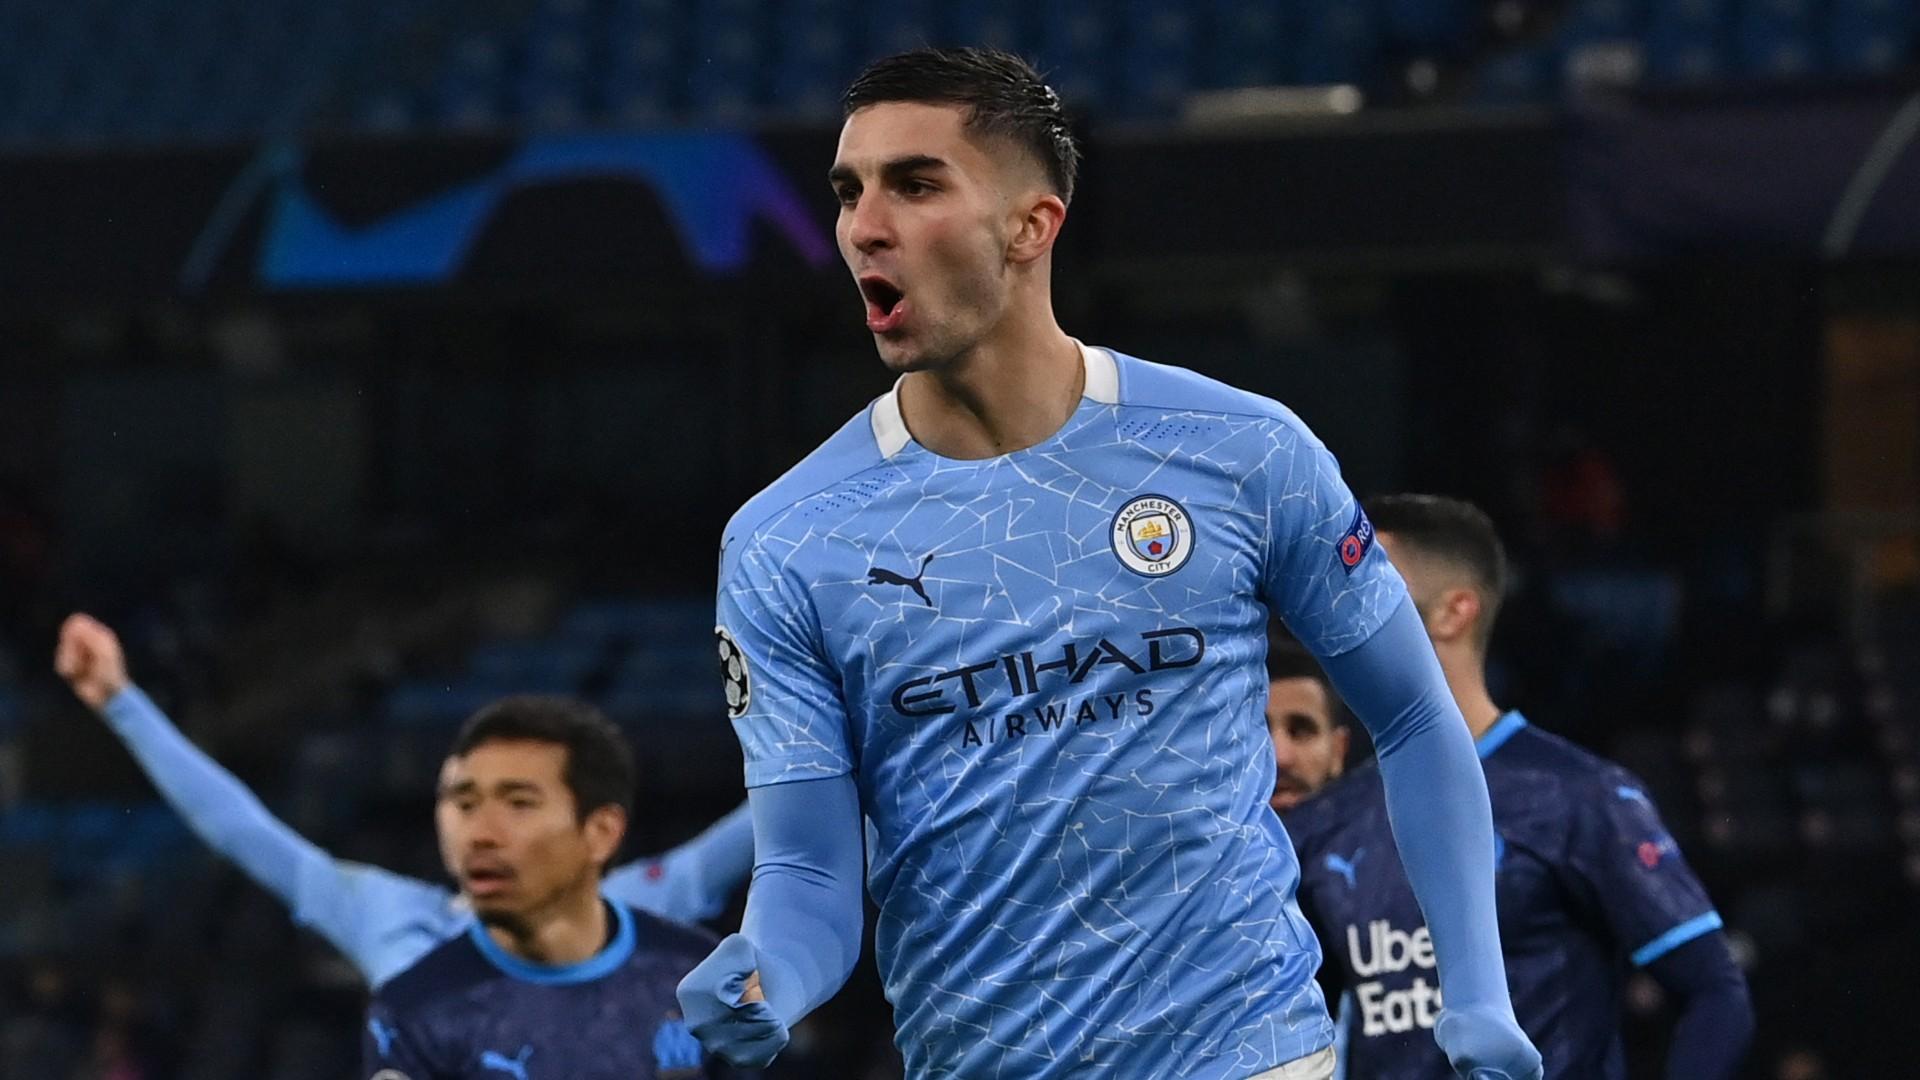 Manchester City 3-0 Marseille: Torres, Aguero and Sterling down Villas-Boas' men